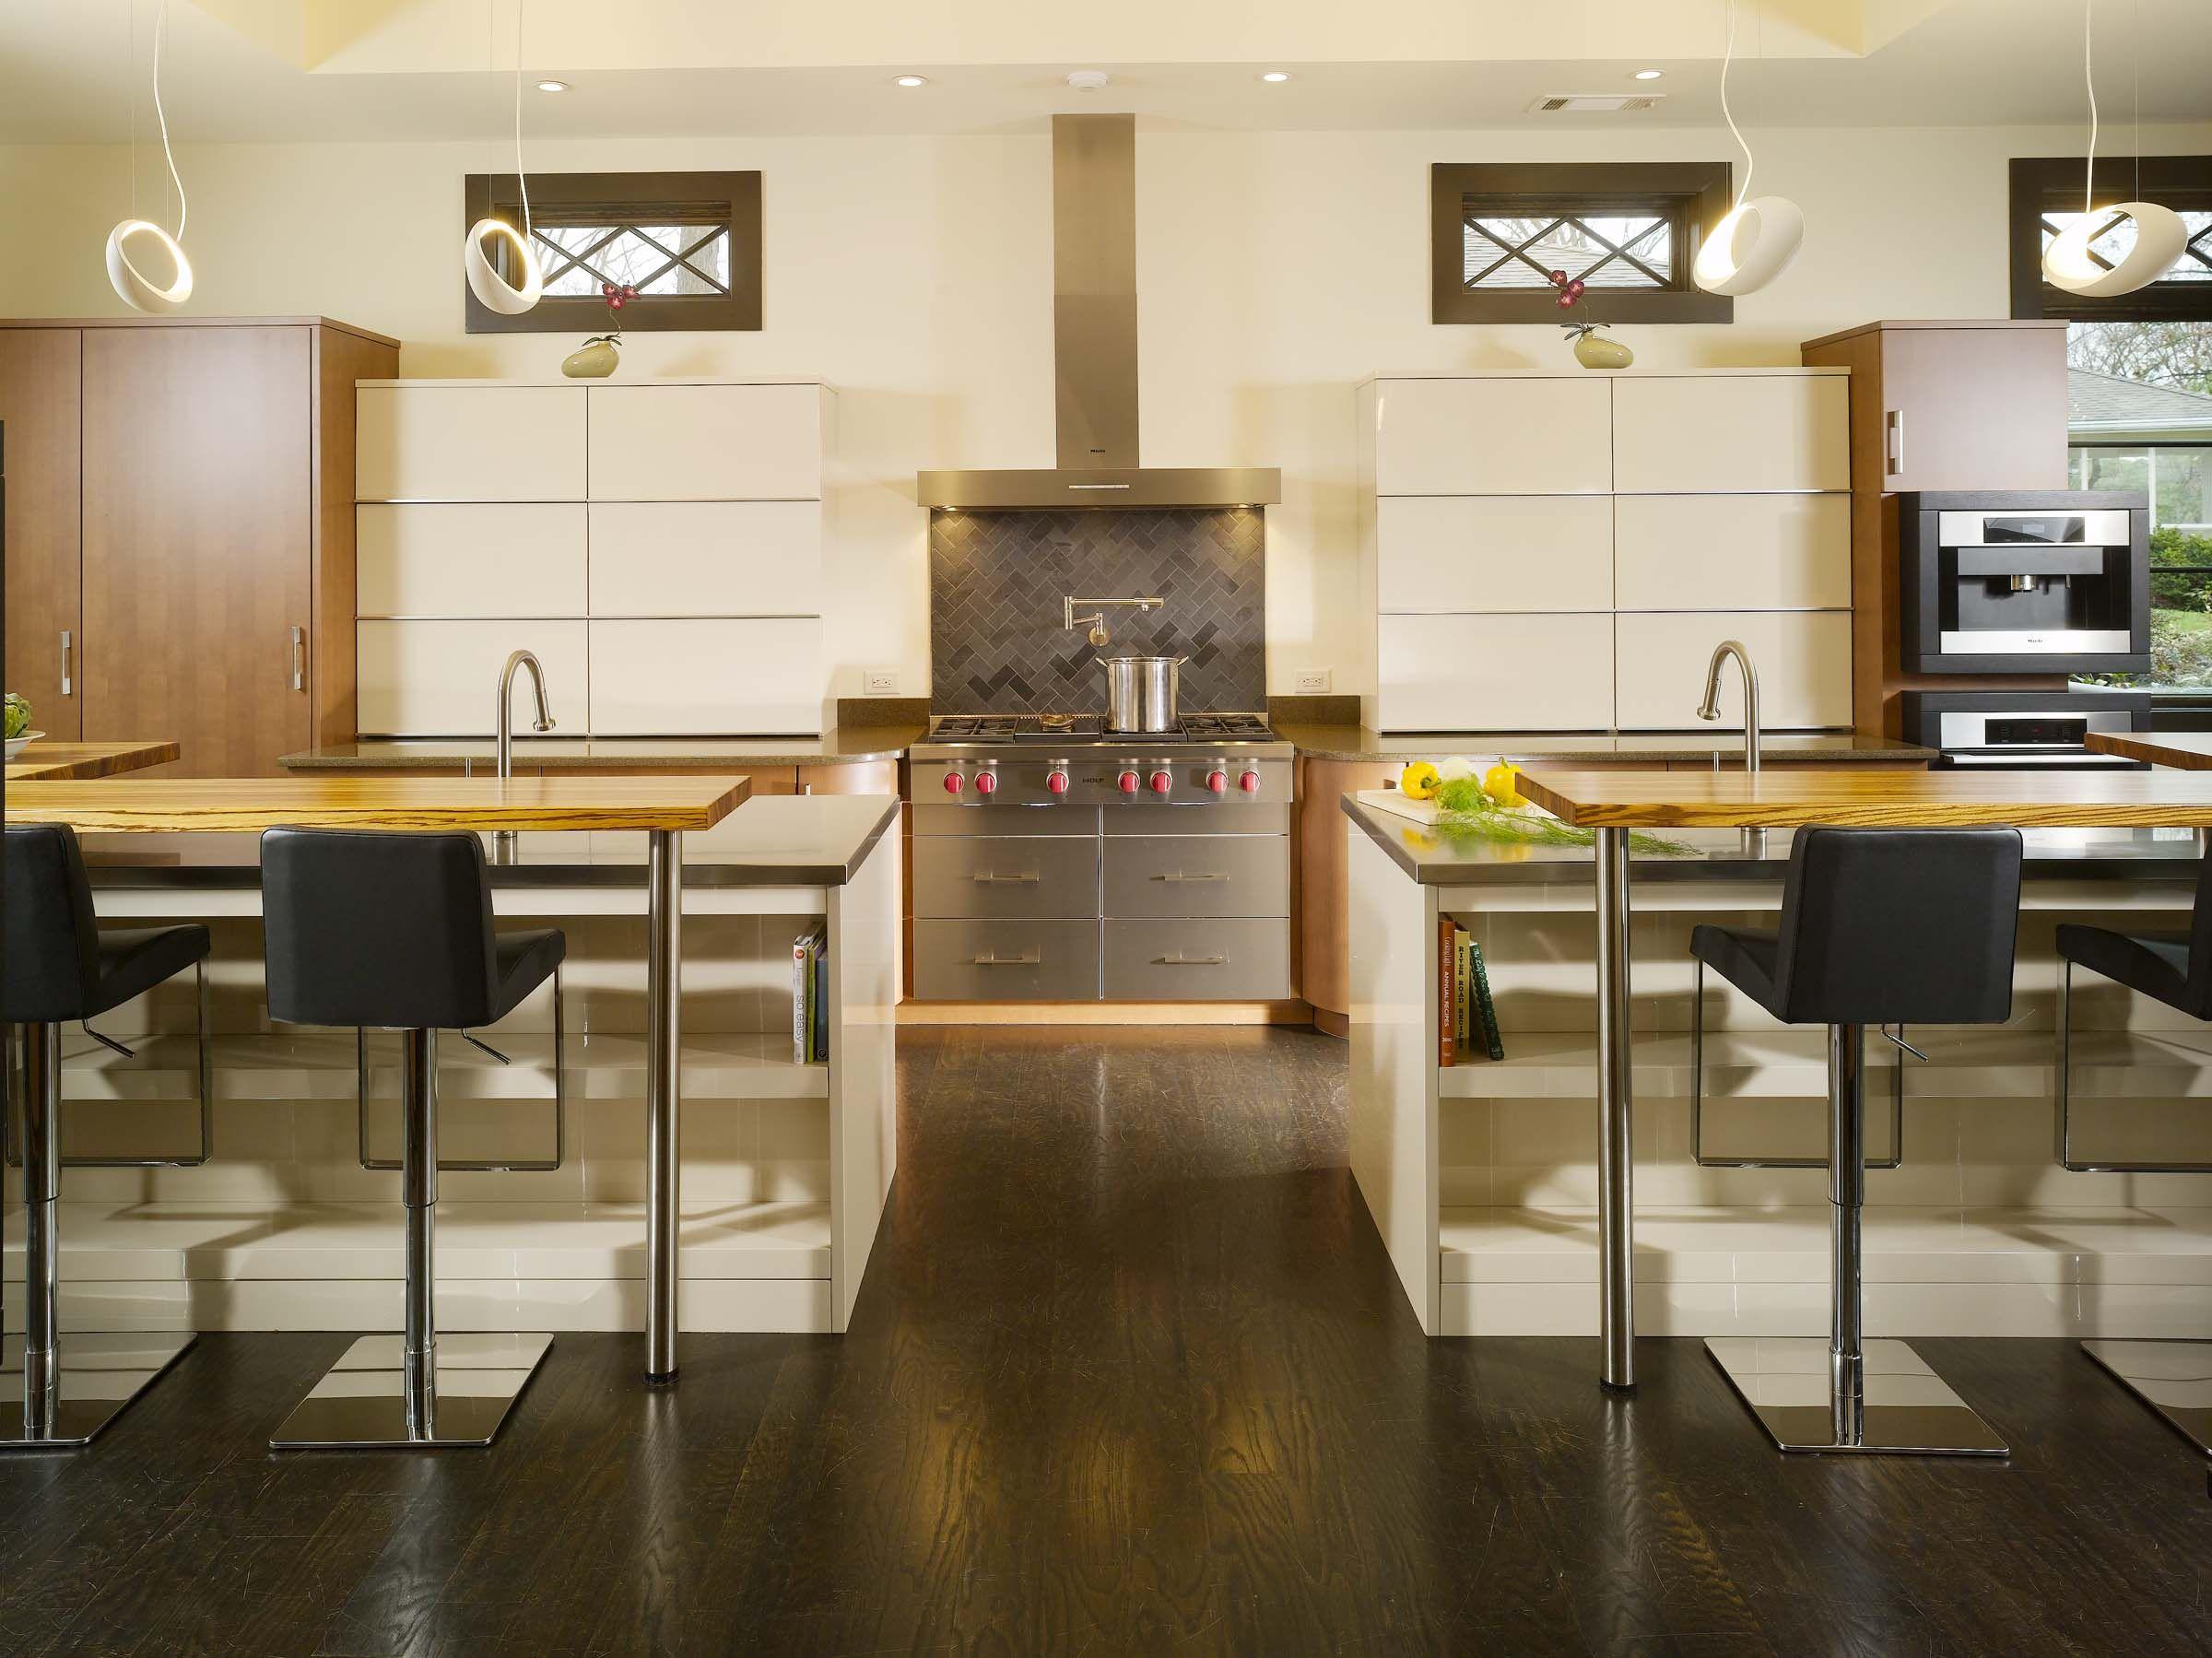 Beautiful open kitchen renovation by CSI Kitchen & Bath Studio #kitchenrenovation #Leicht